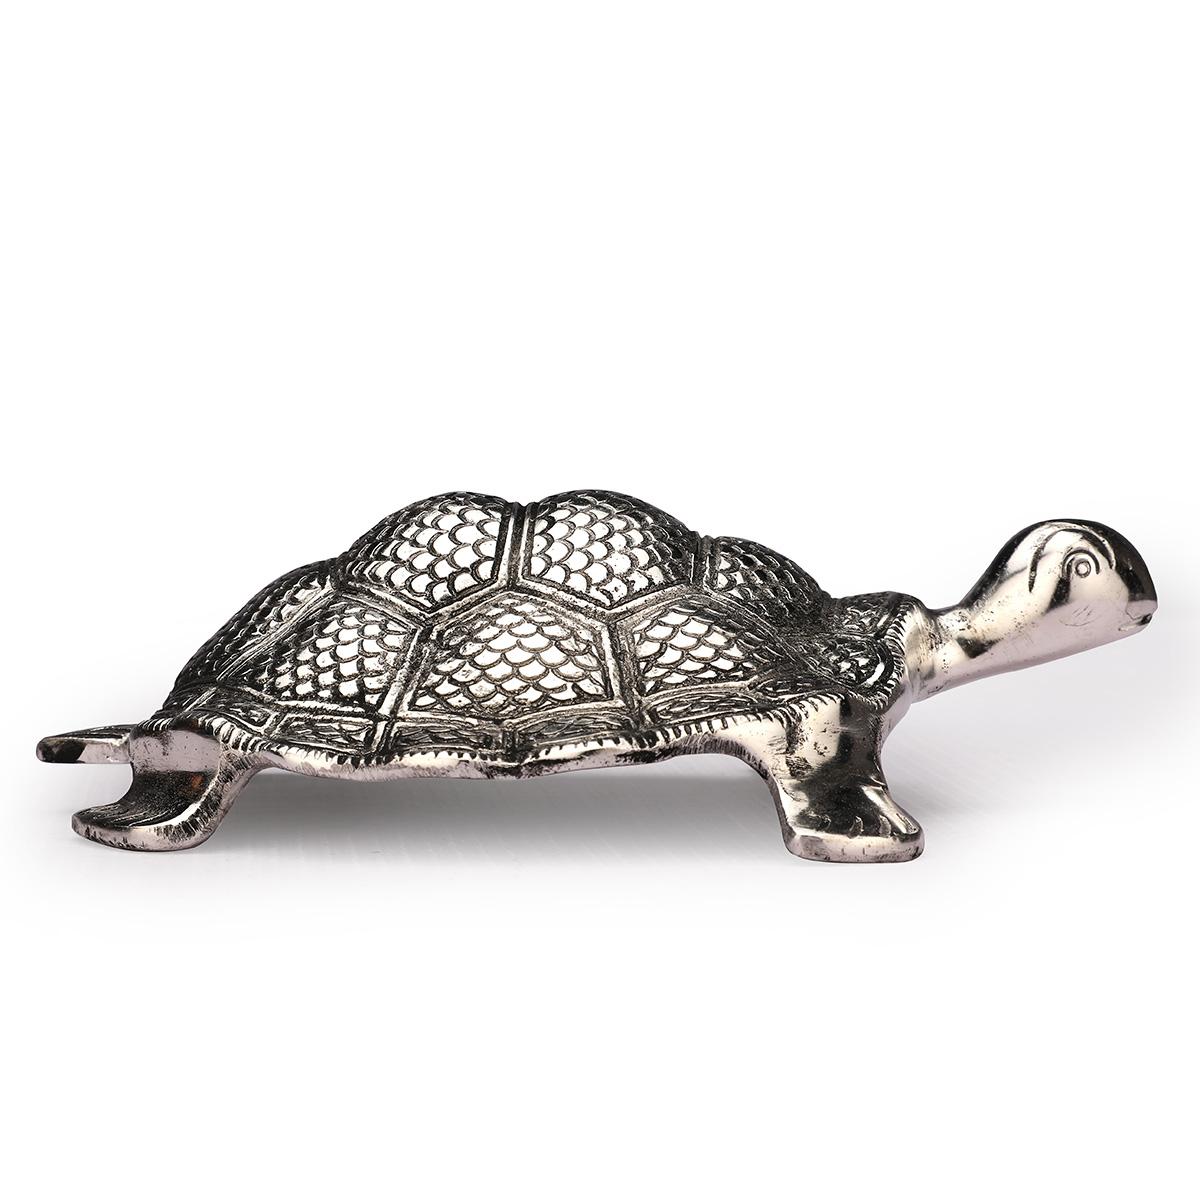 Tortoies 5'' Silver